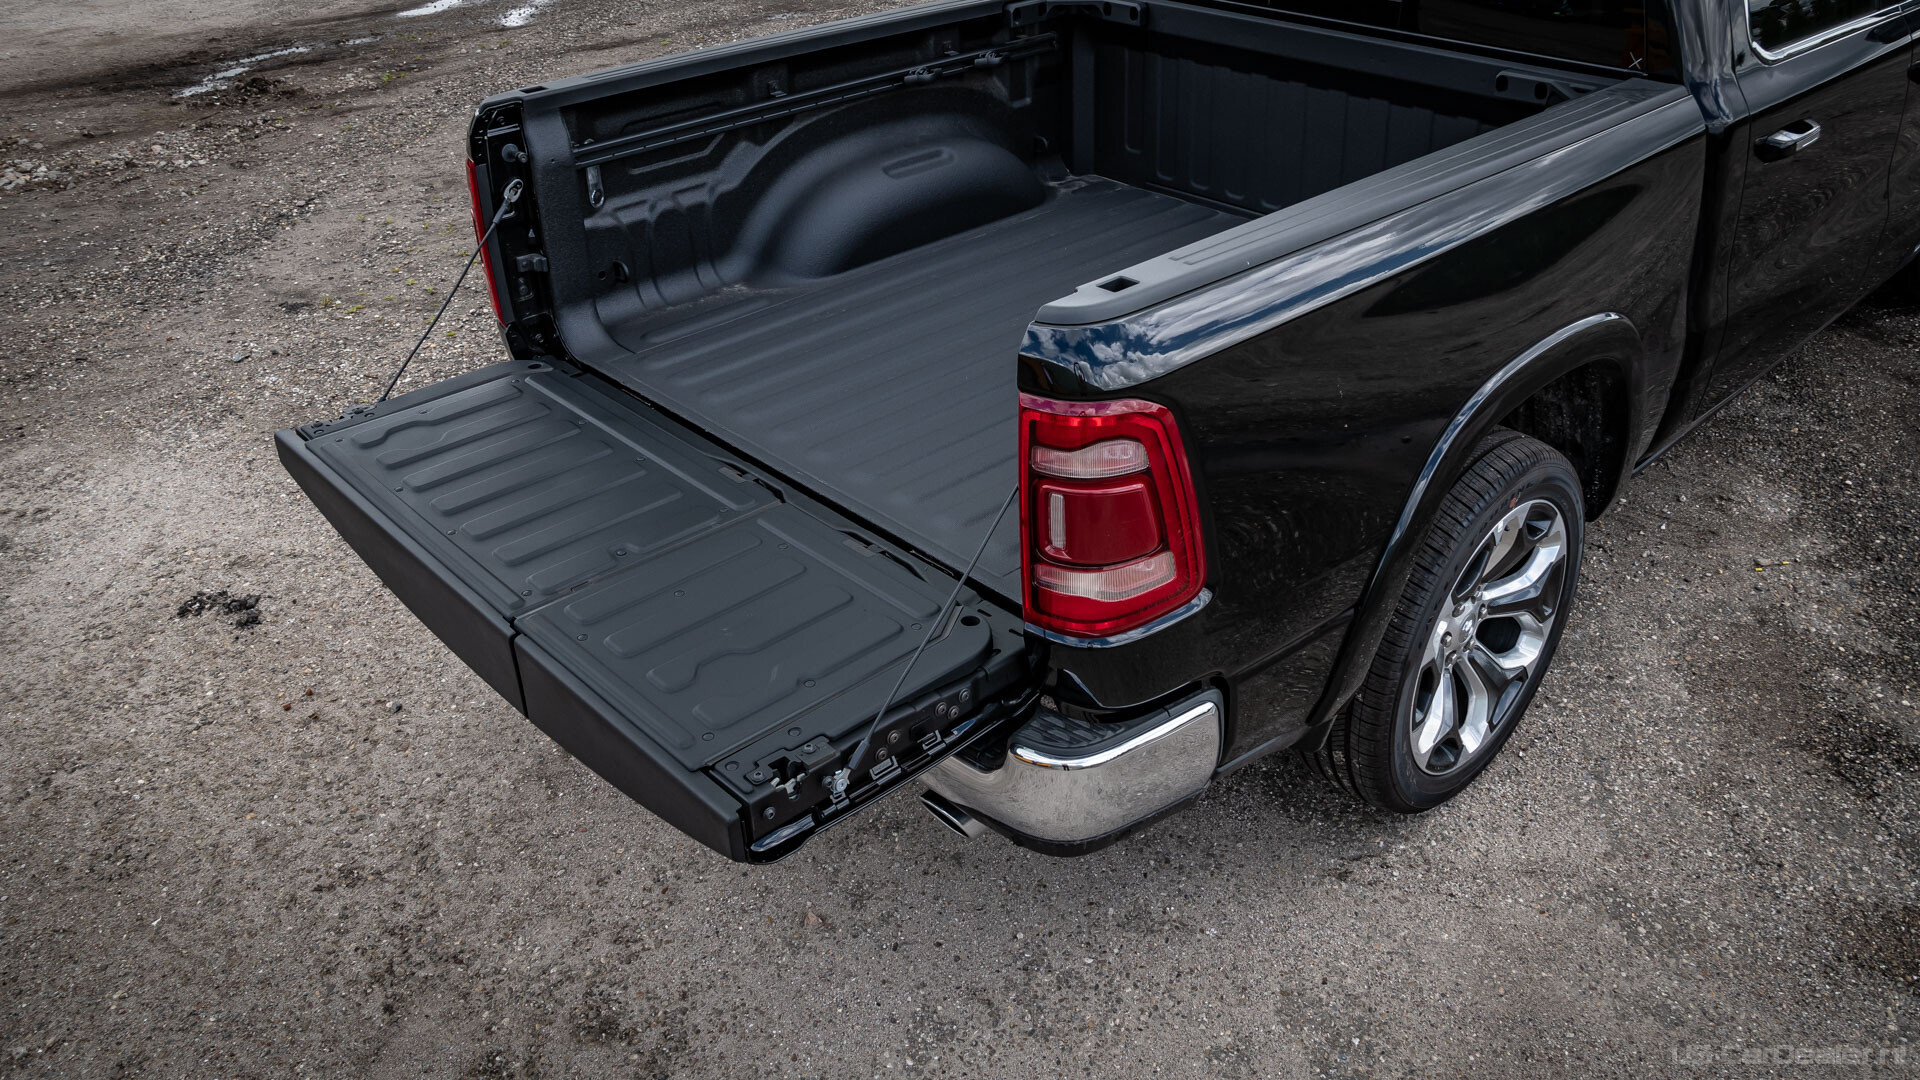 Ram 1500 multifunctional tailgate